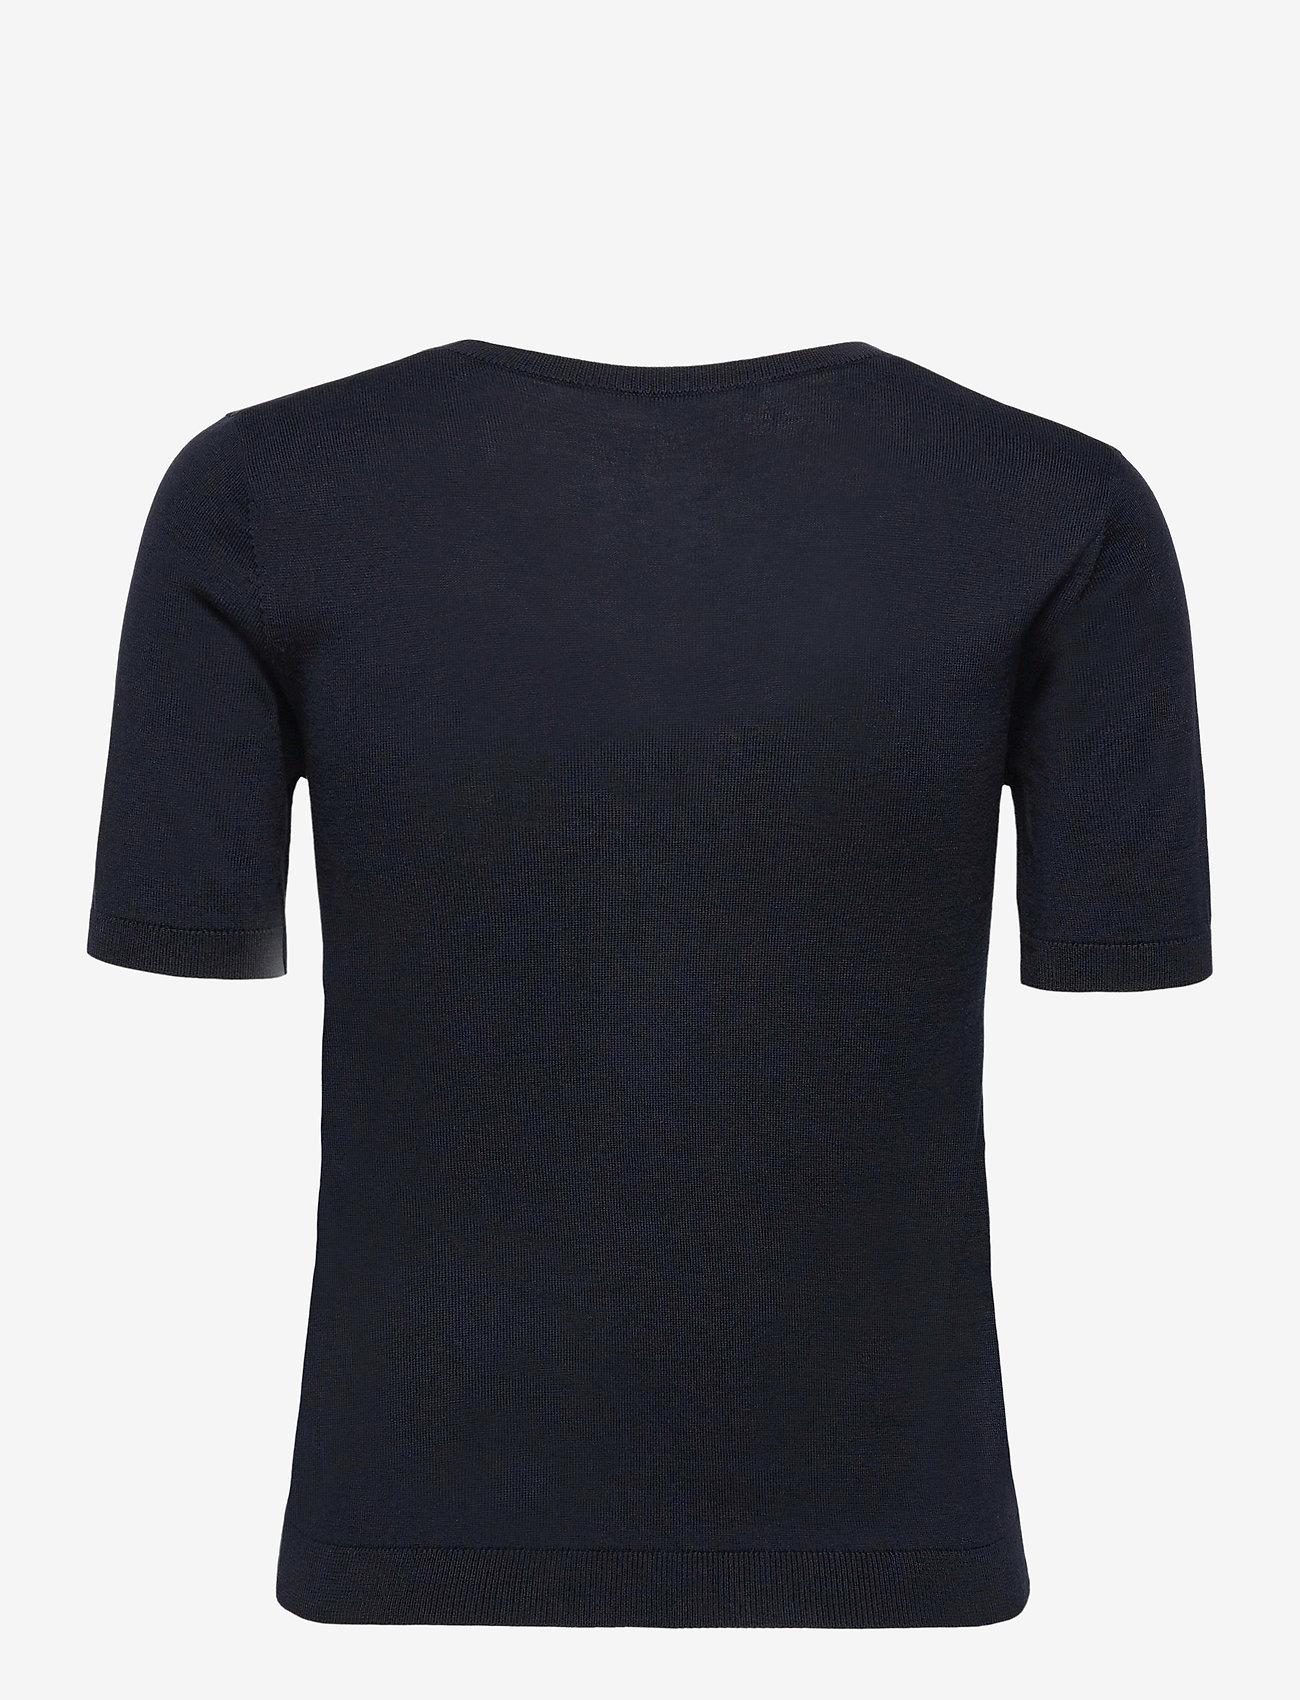 Weekend Max Mara - CAIRO - gebreide t-shirts - navy - 1